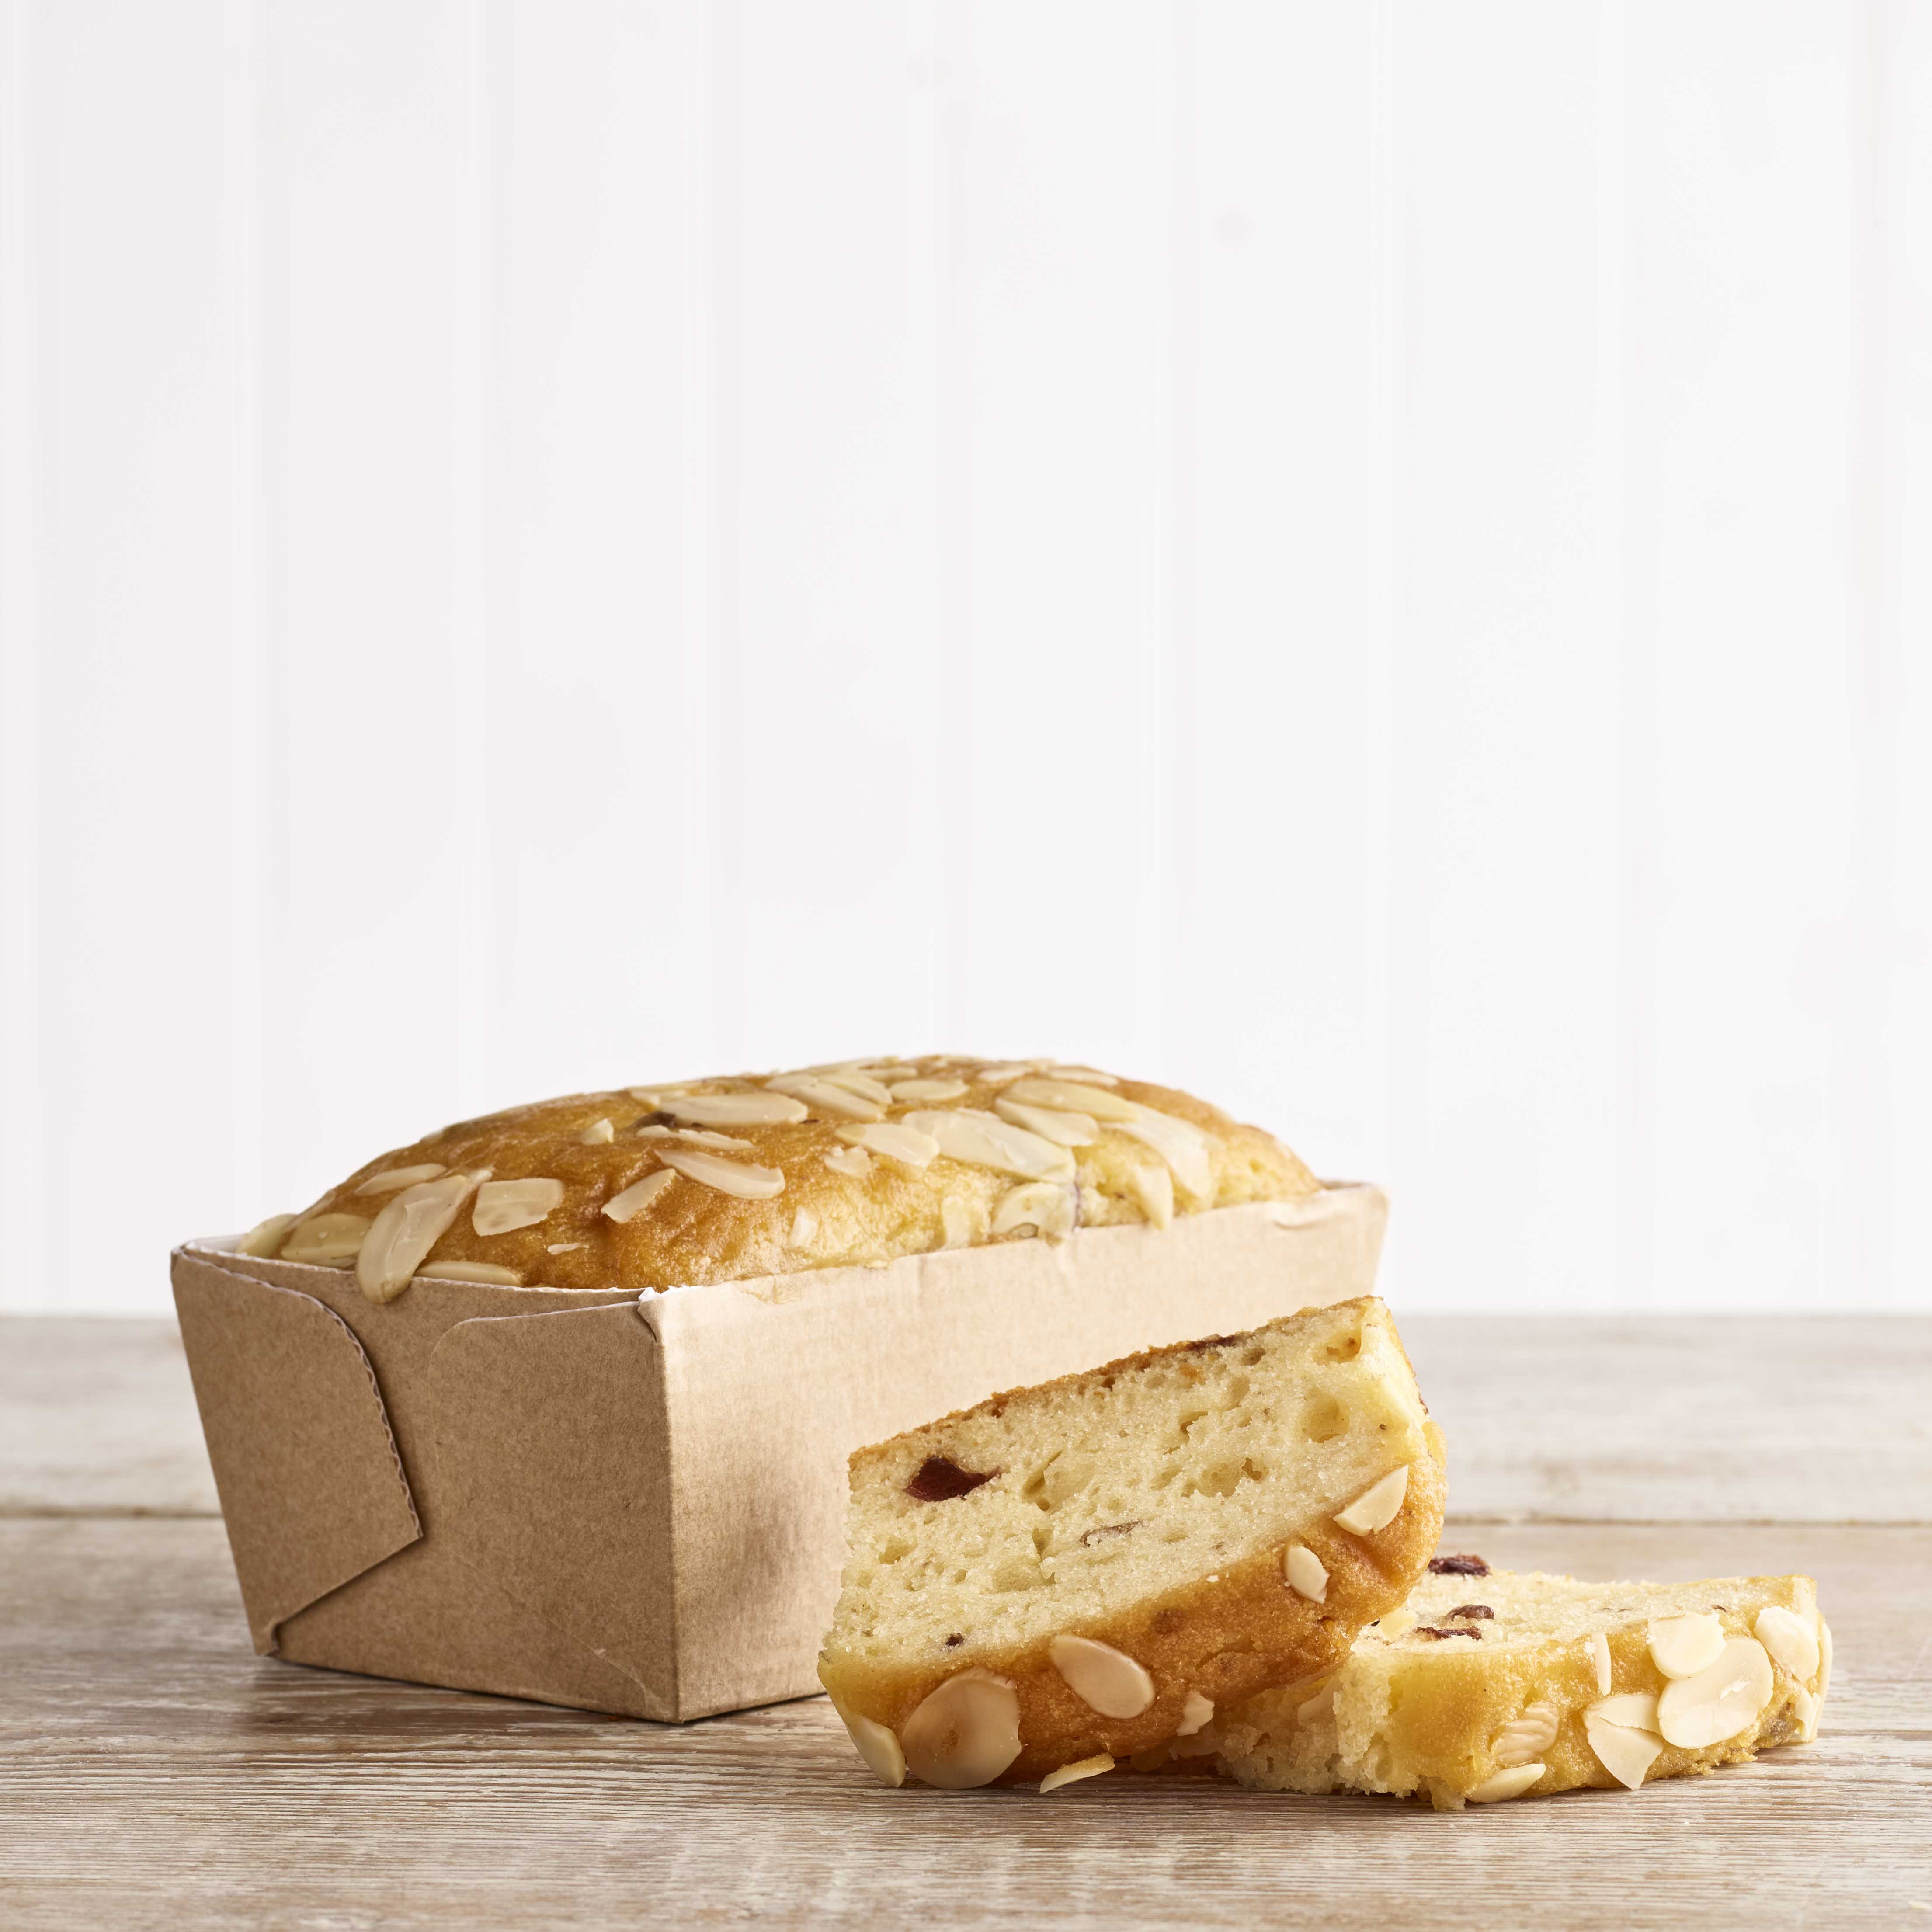 The Original Cake Company Cherry Bakewell Sponge Loaf, 290g